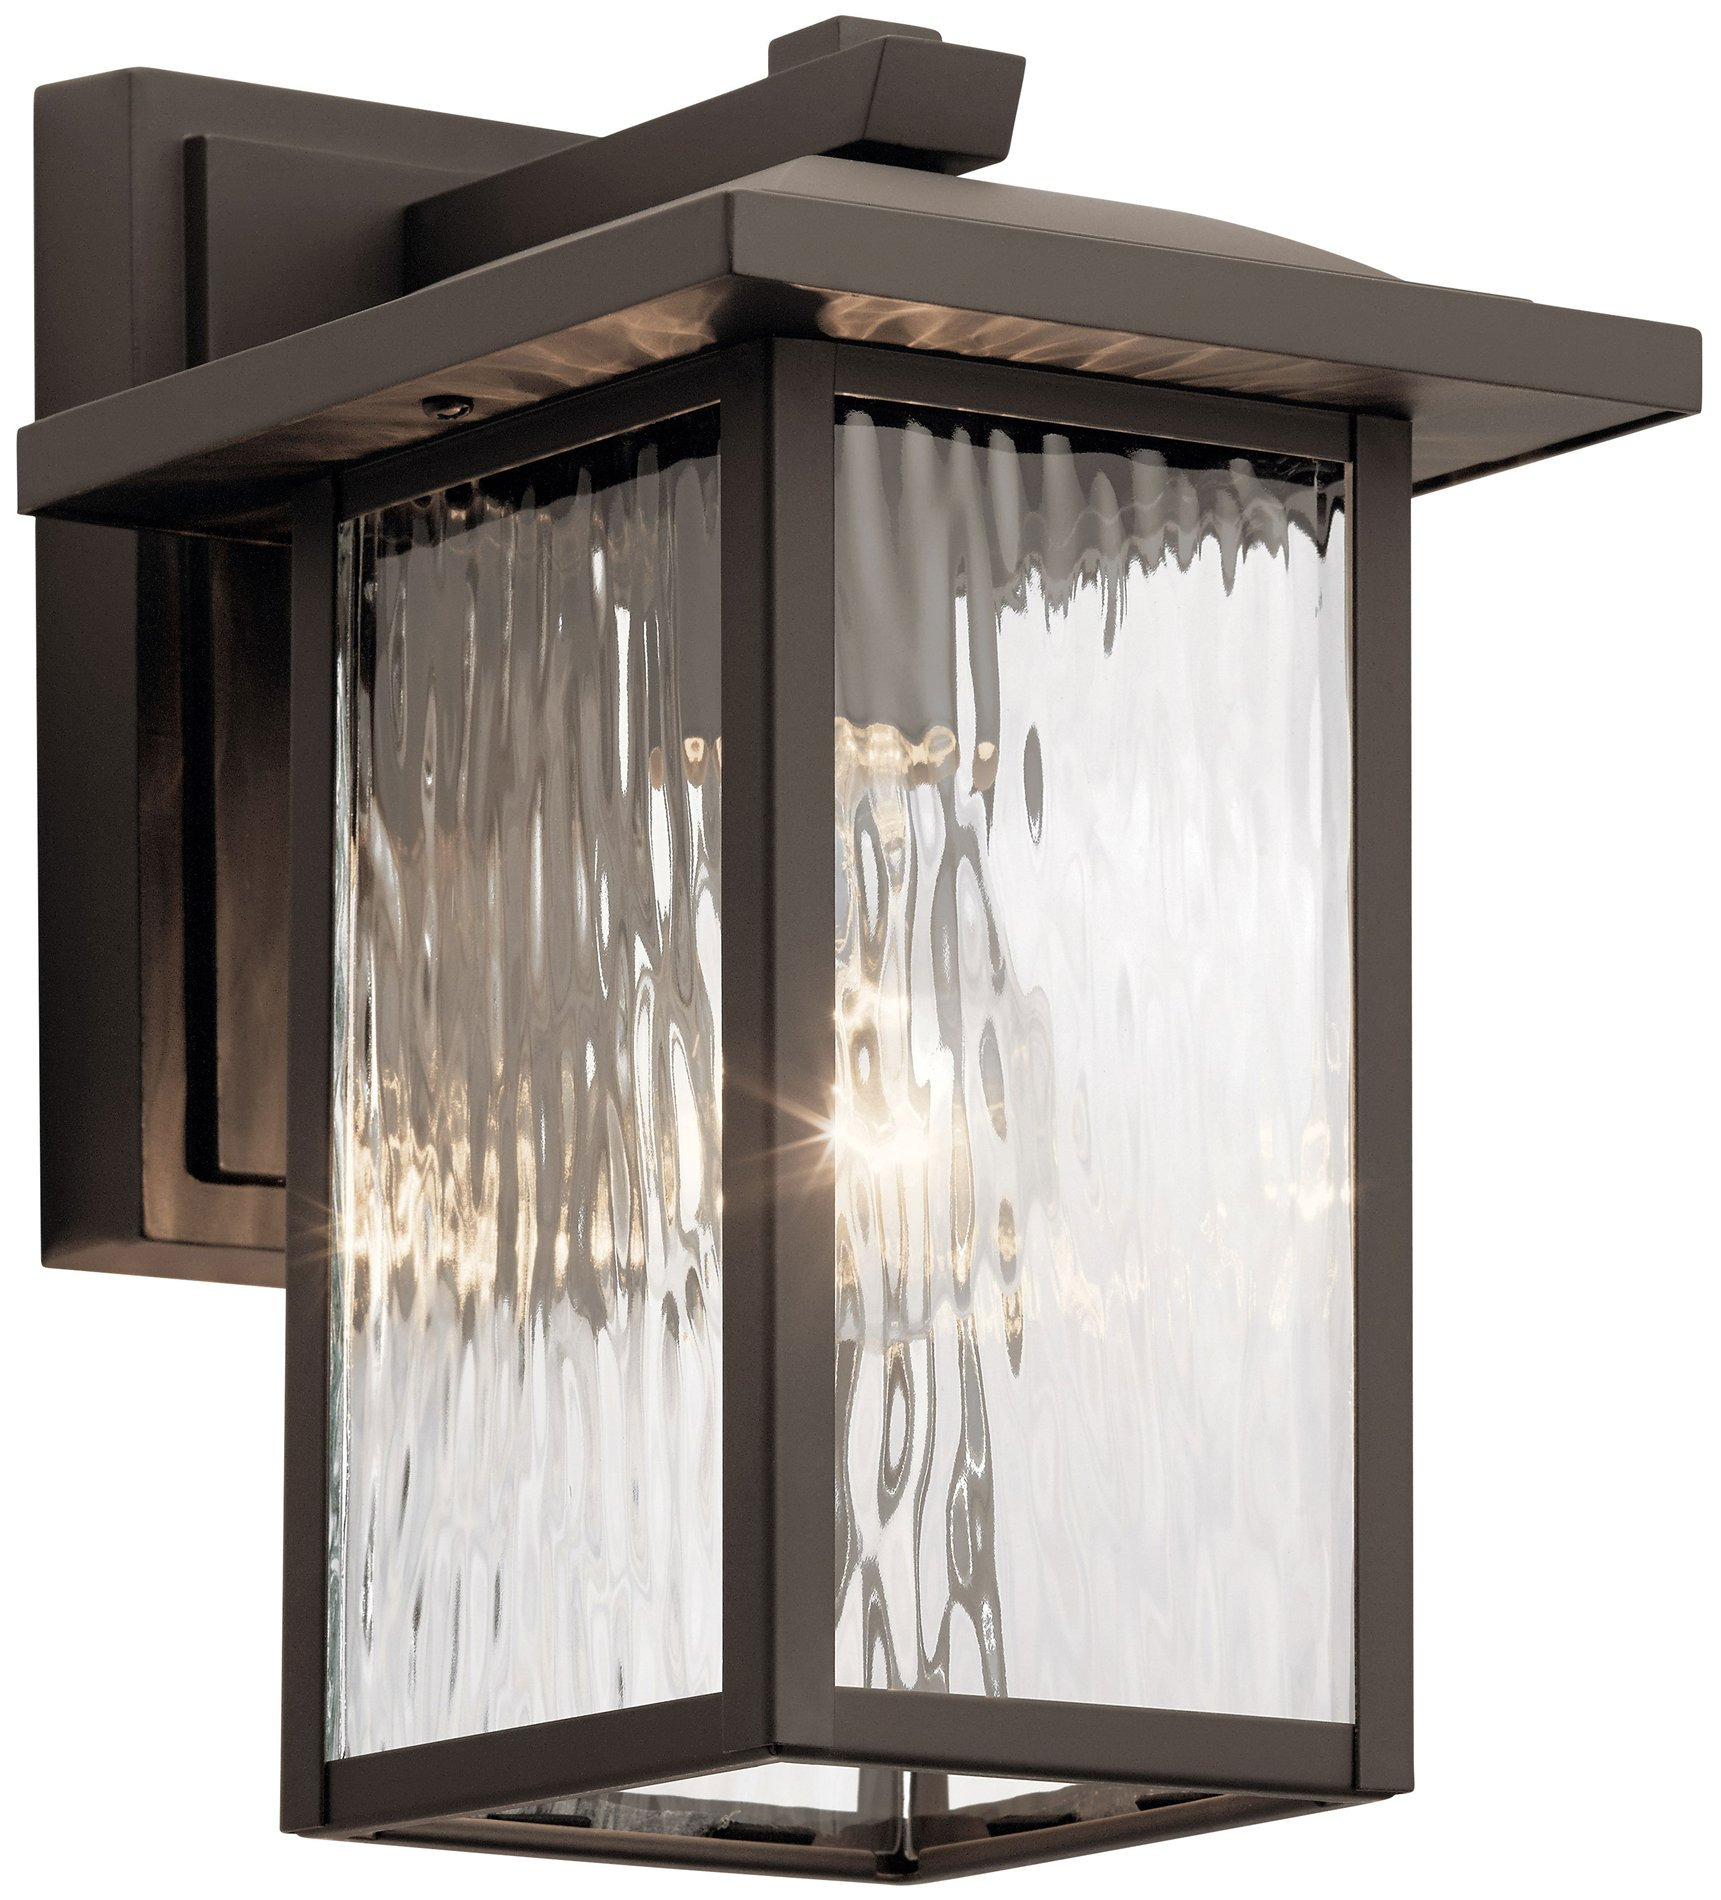 Kichler Lighting 49924oz Capanna Modern Contemporary Outdoor Wall Sconce Kch 49924oz